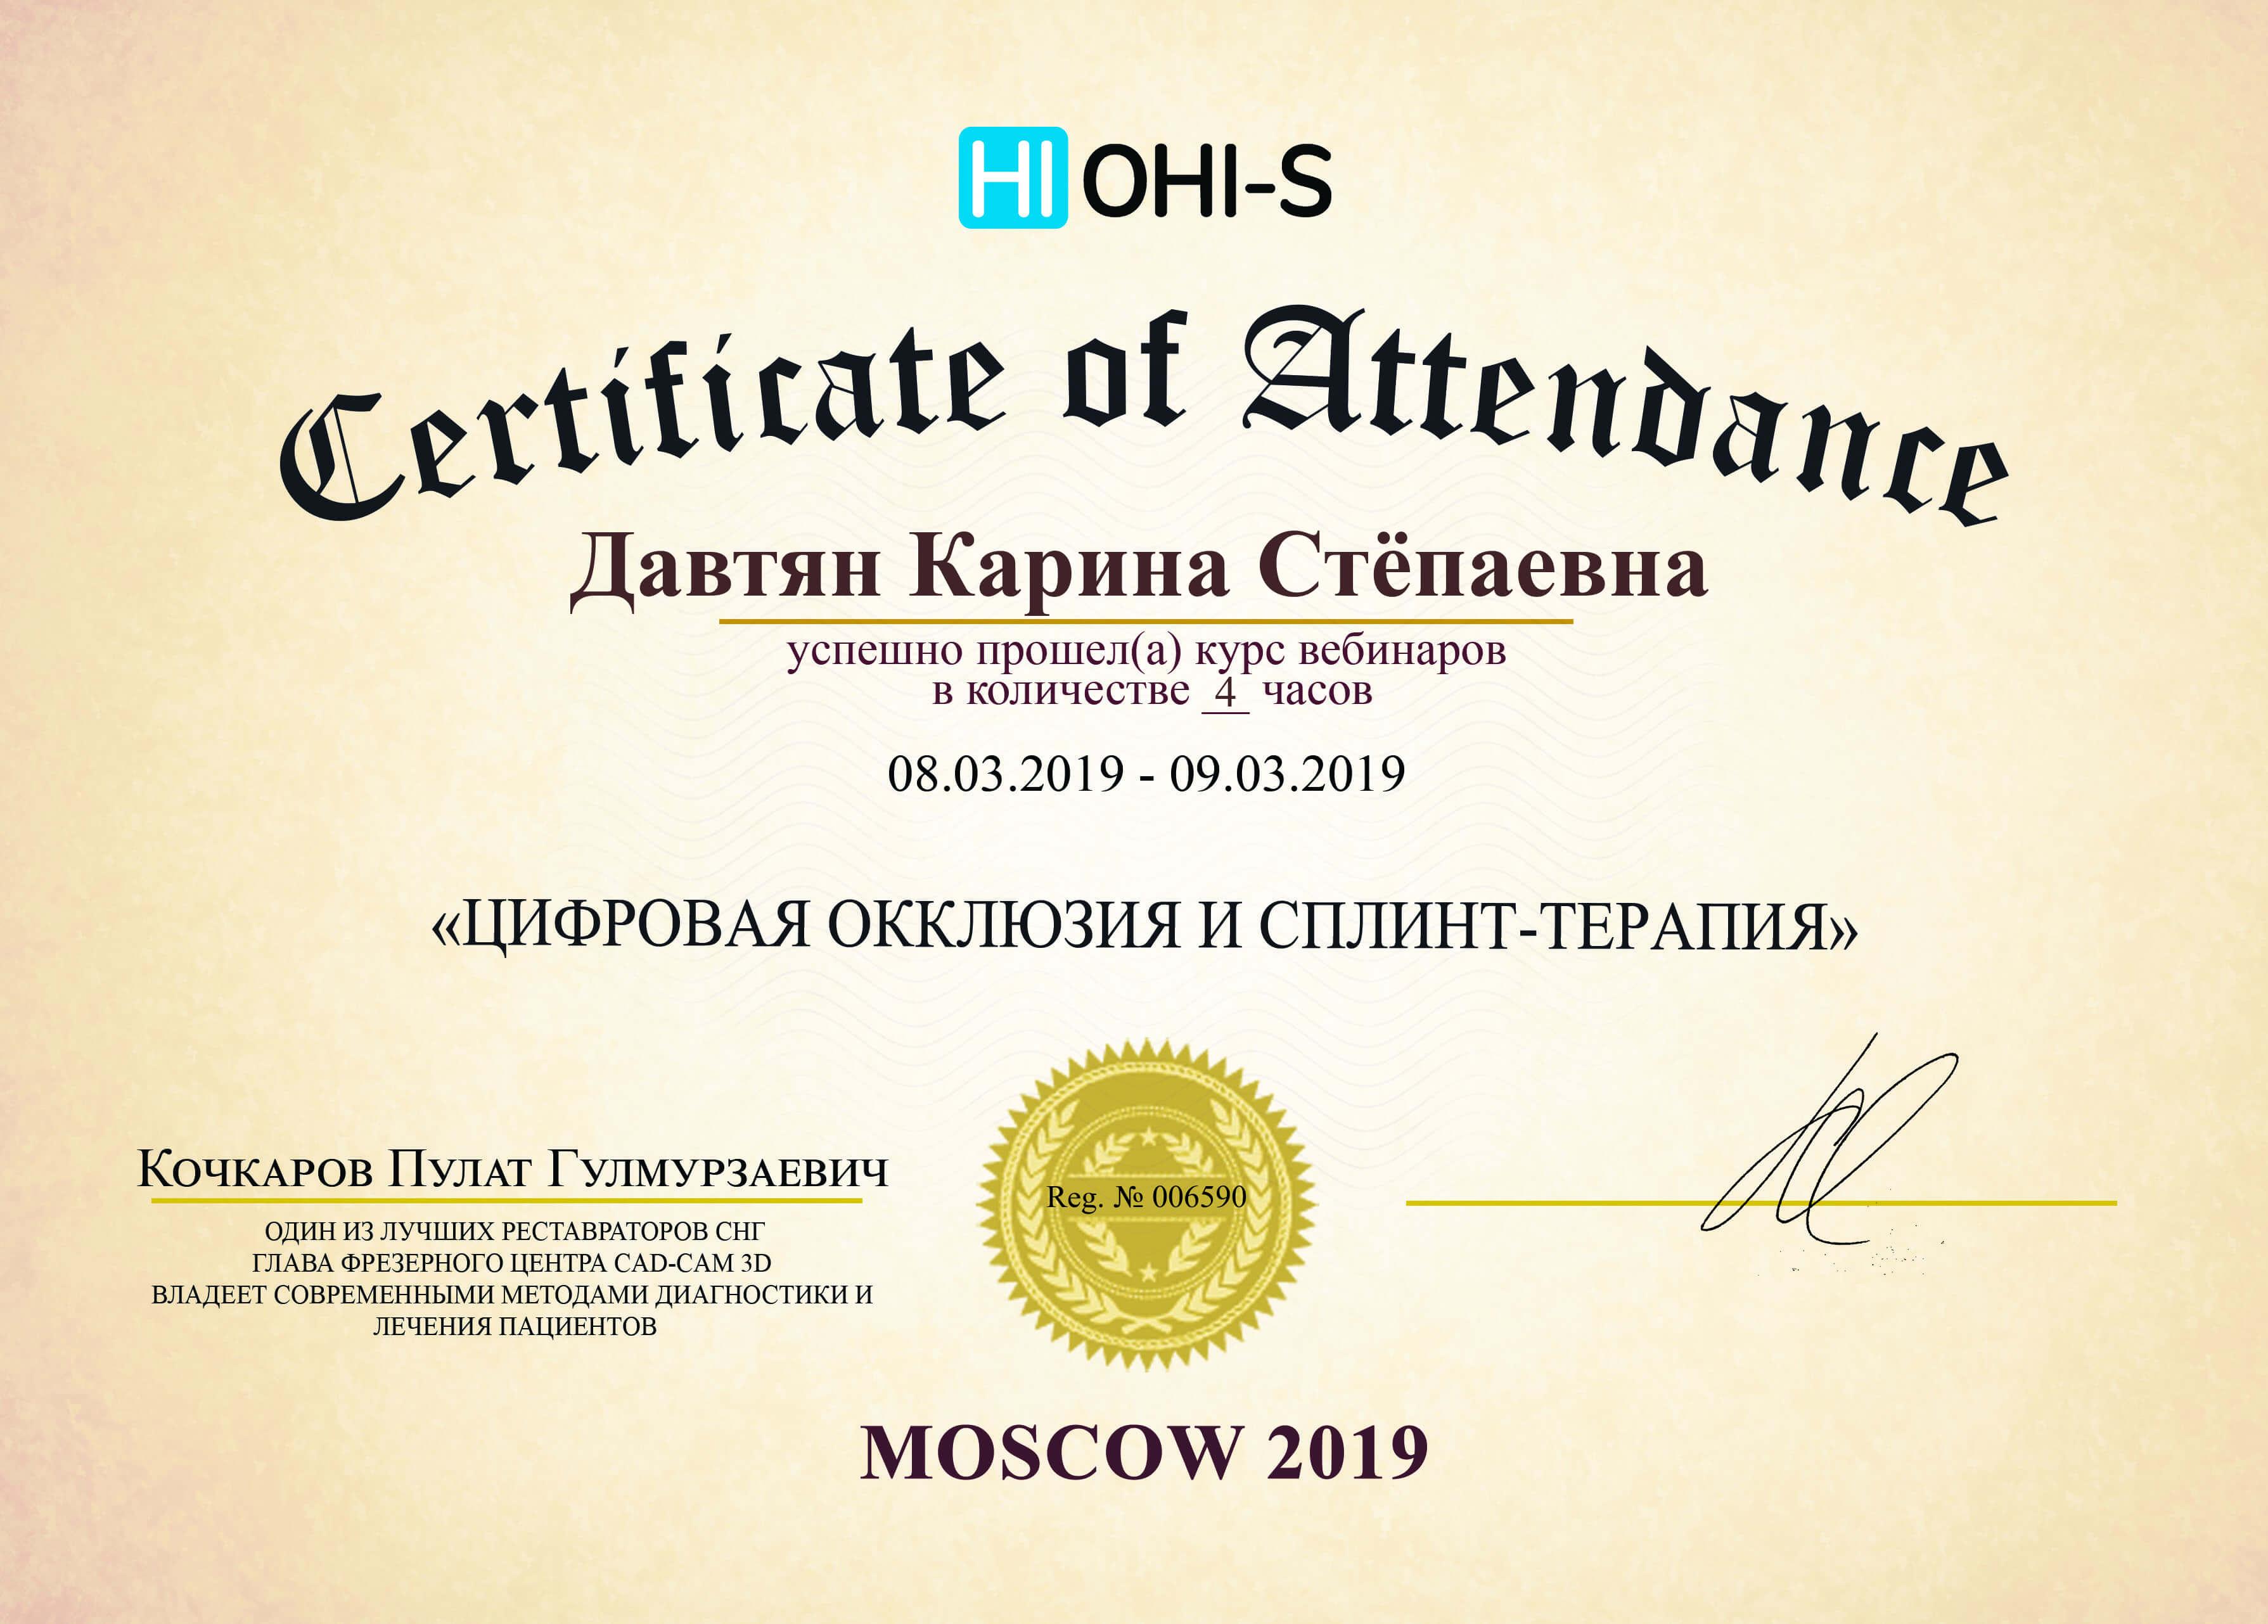 davtyan_karina_stepaevna-006590